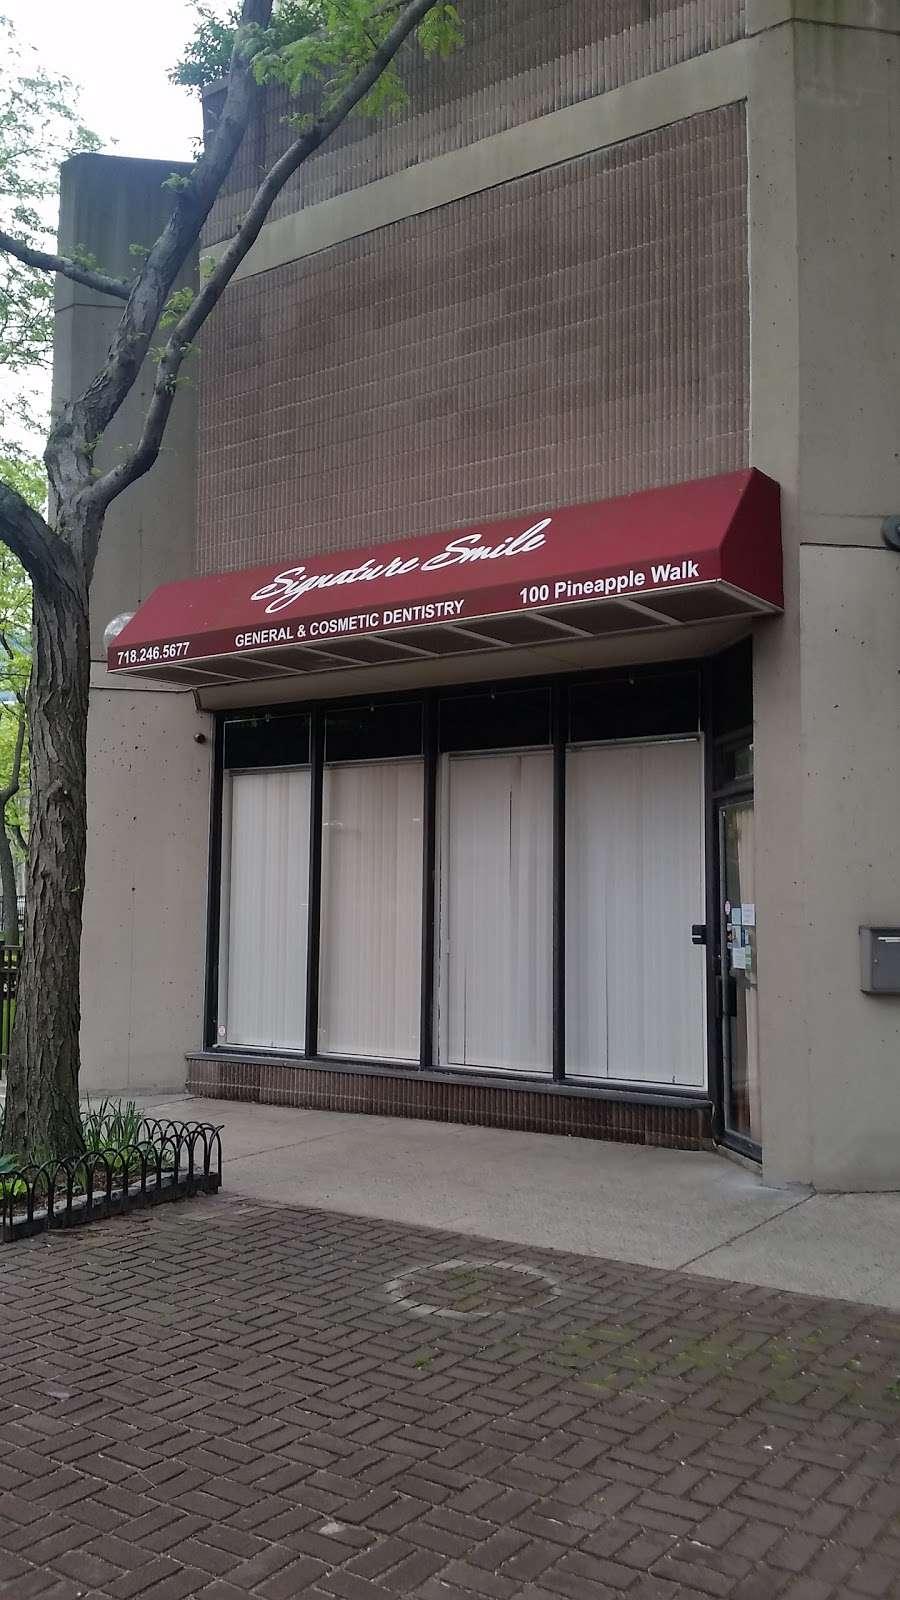 Signature Smile Dental - dentist  | Photo 3 of 8 | Address: 100 Pineapple Walk, Brooklyn, NY 11201, USA | Phone: (718) 246-5677